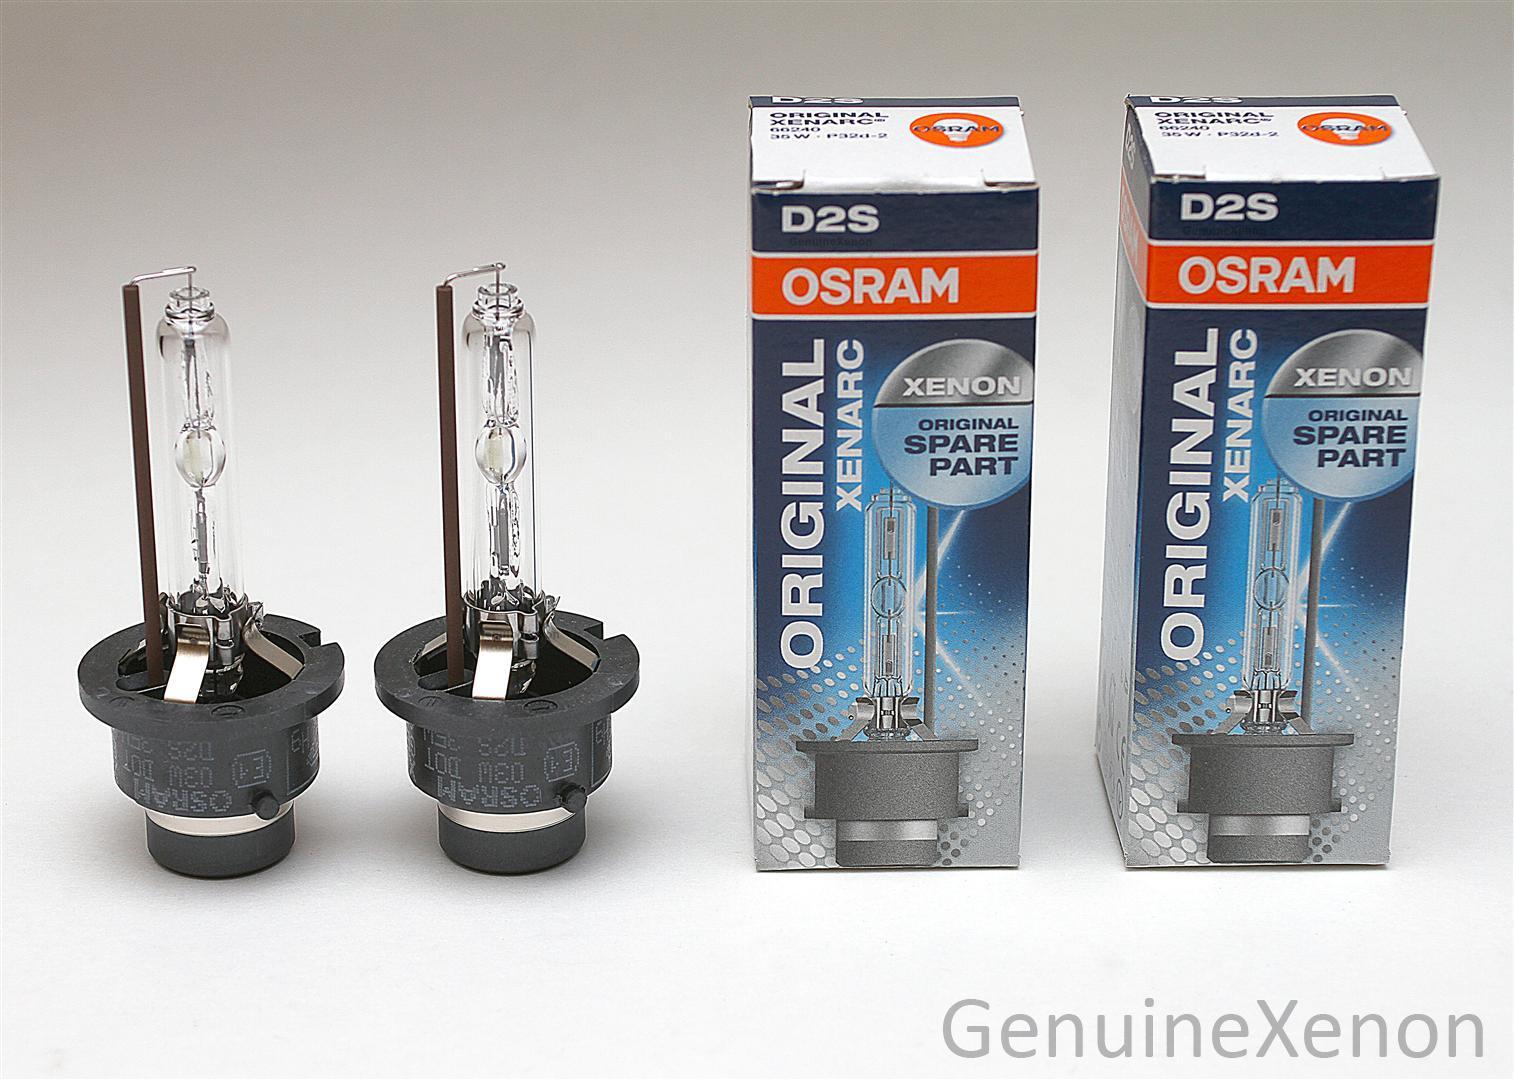 osram 2x lampen set osram xenarc xenon 66240 35w d2s. Black Bedroom Furniture Sets. Home Design Ideas